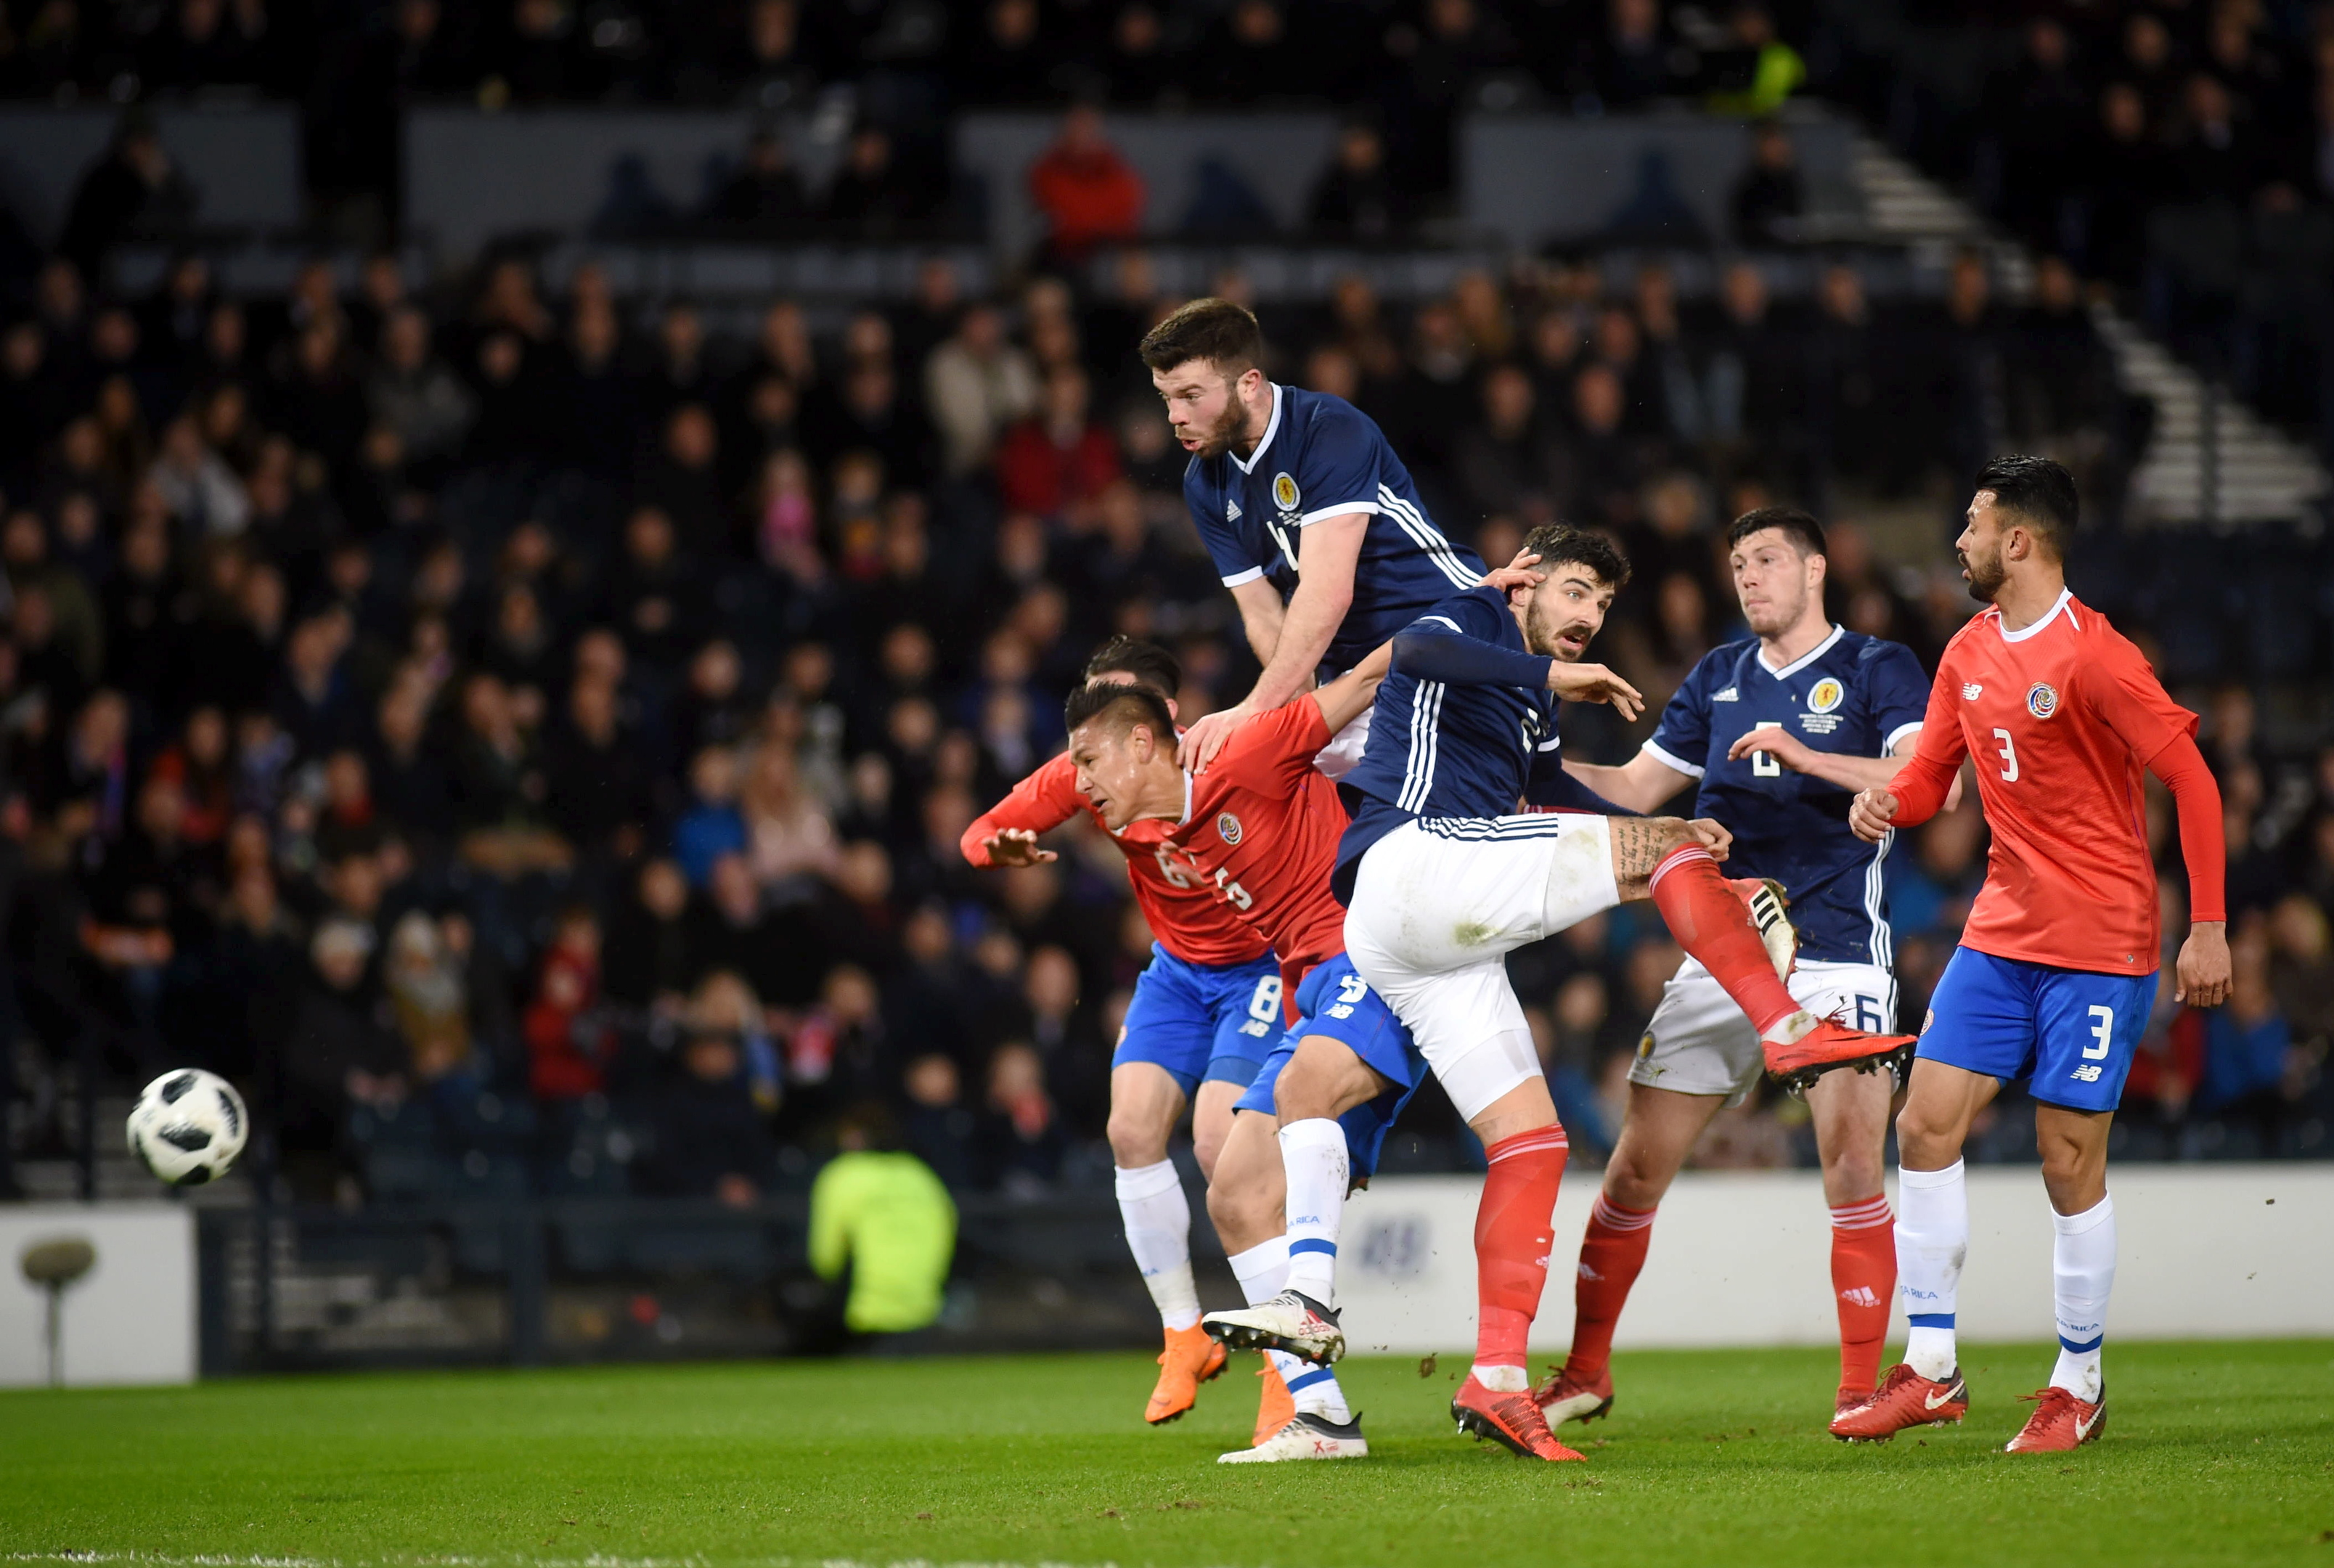 Scotland's Grant Hanley heading at goal.